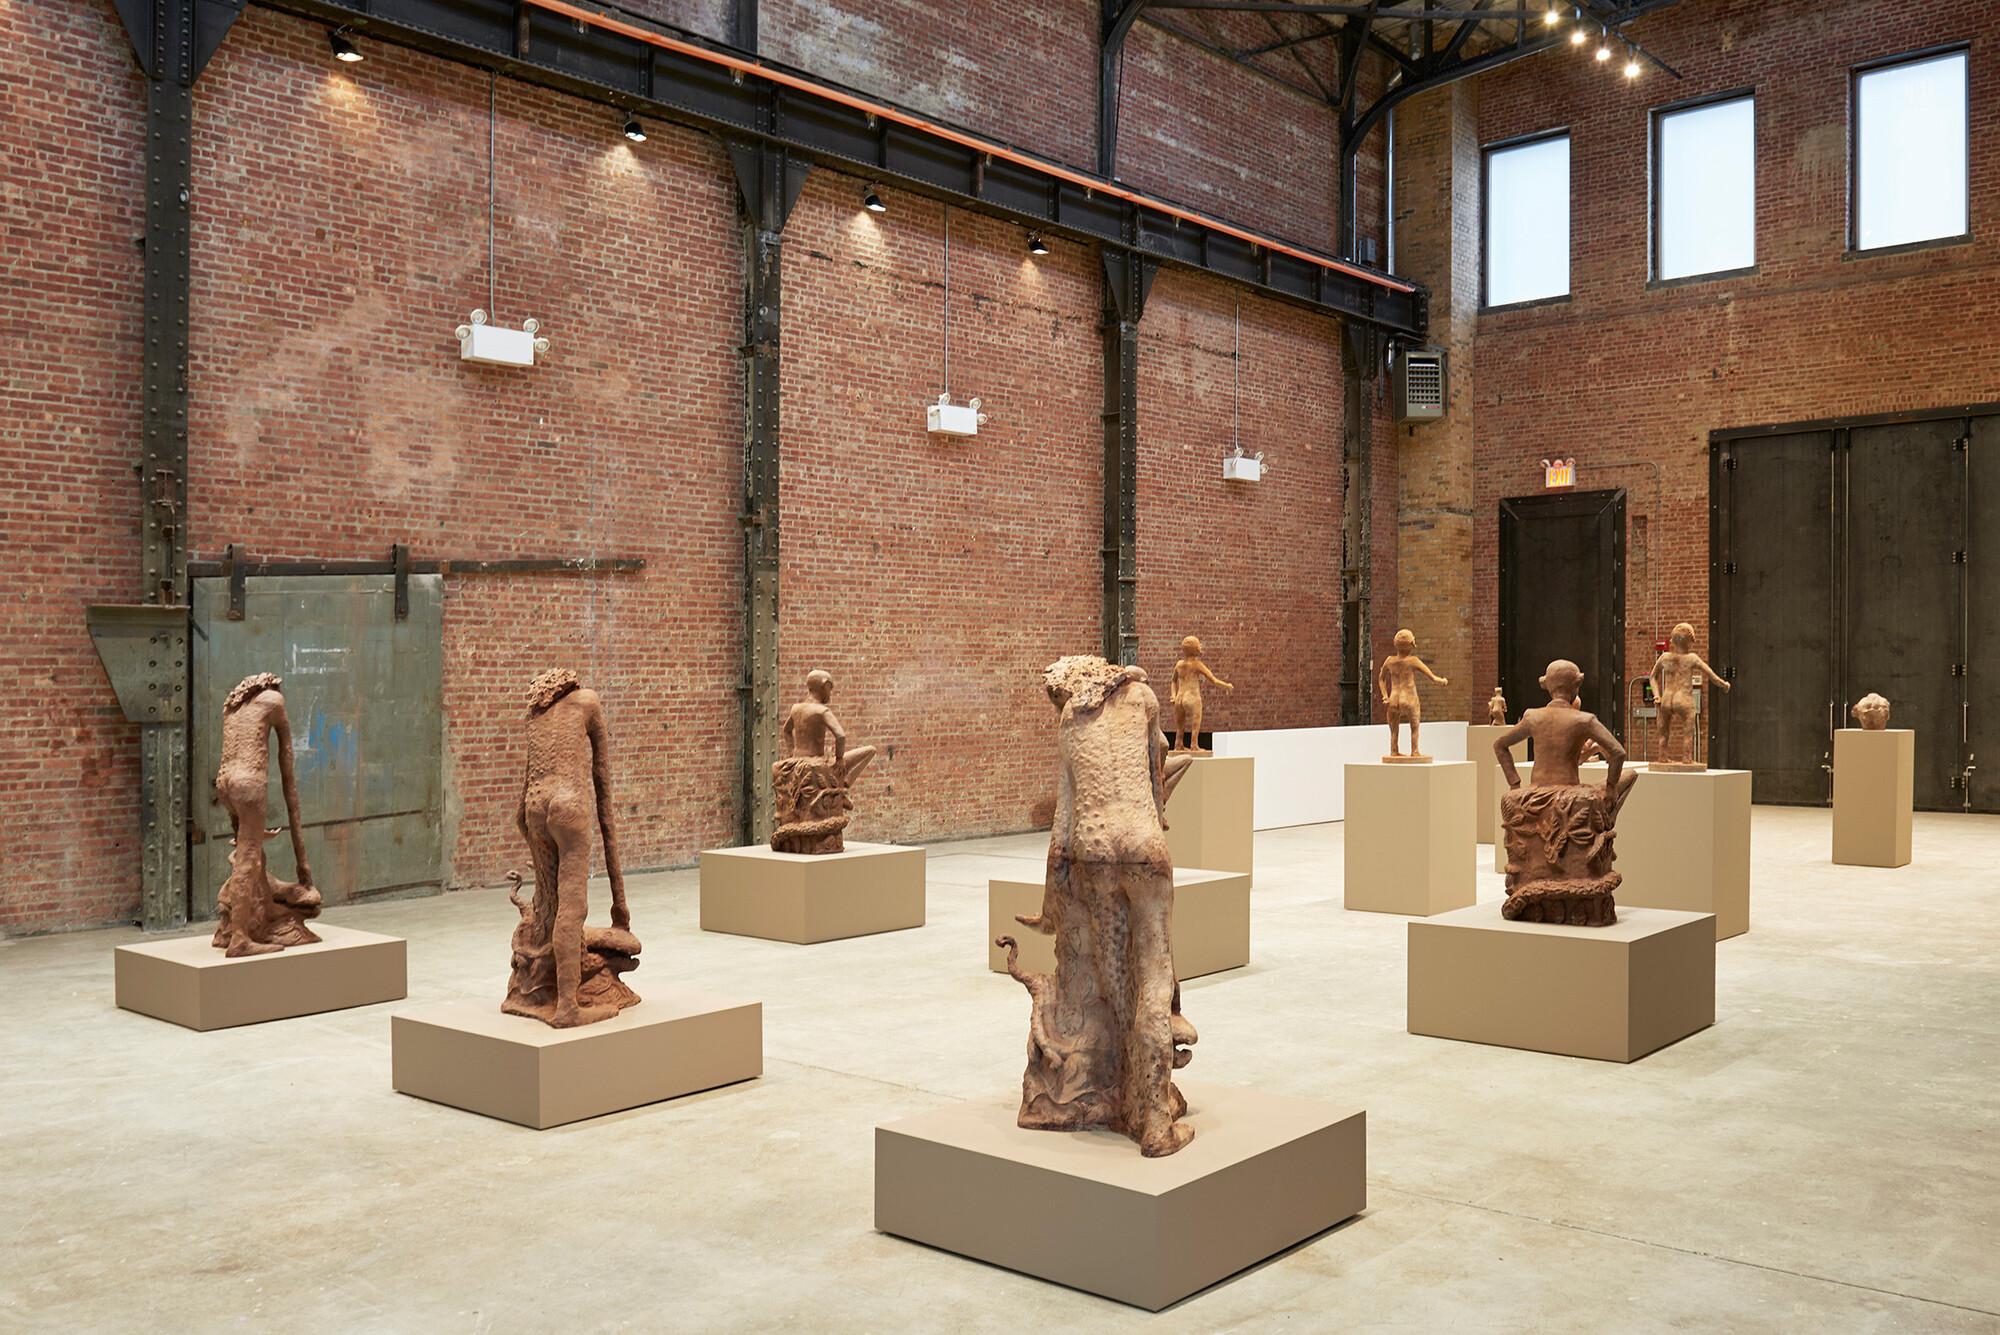 sculpturecenter s winter exhibitions art jobs news view of cercle d art des travailleurs de plantation congolaise sculpturecenter new york 2017 photo kyle knodell